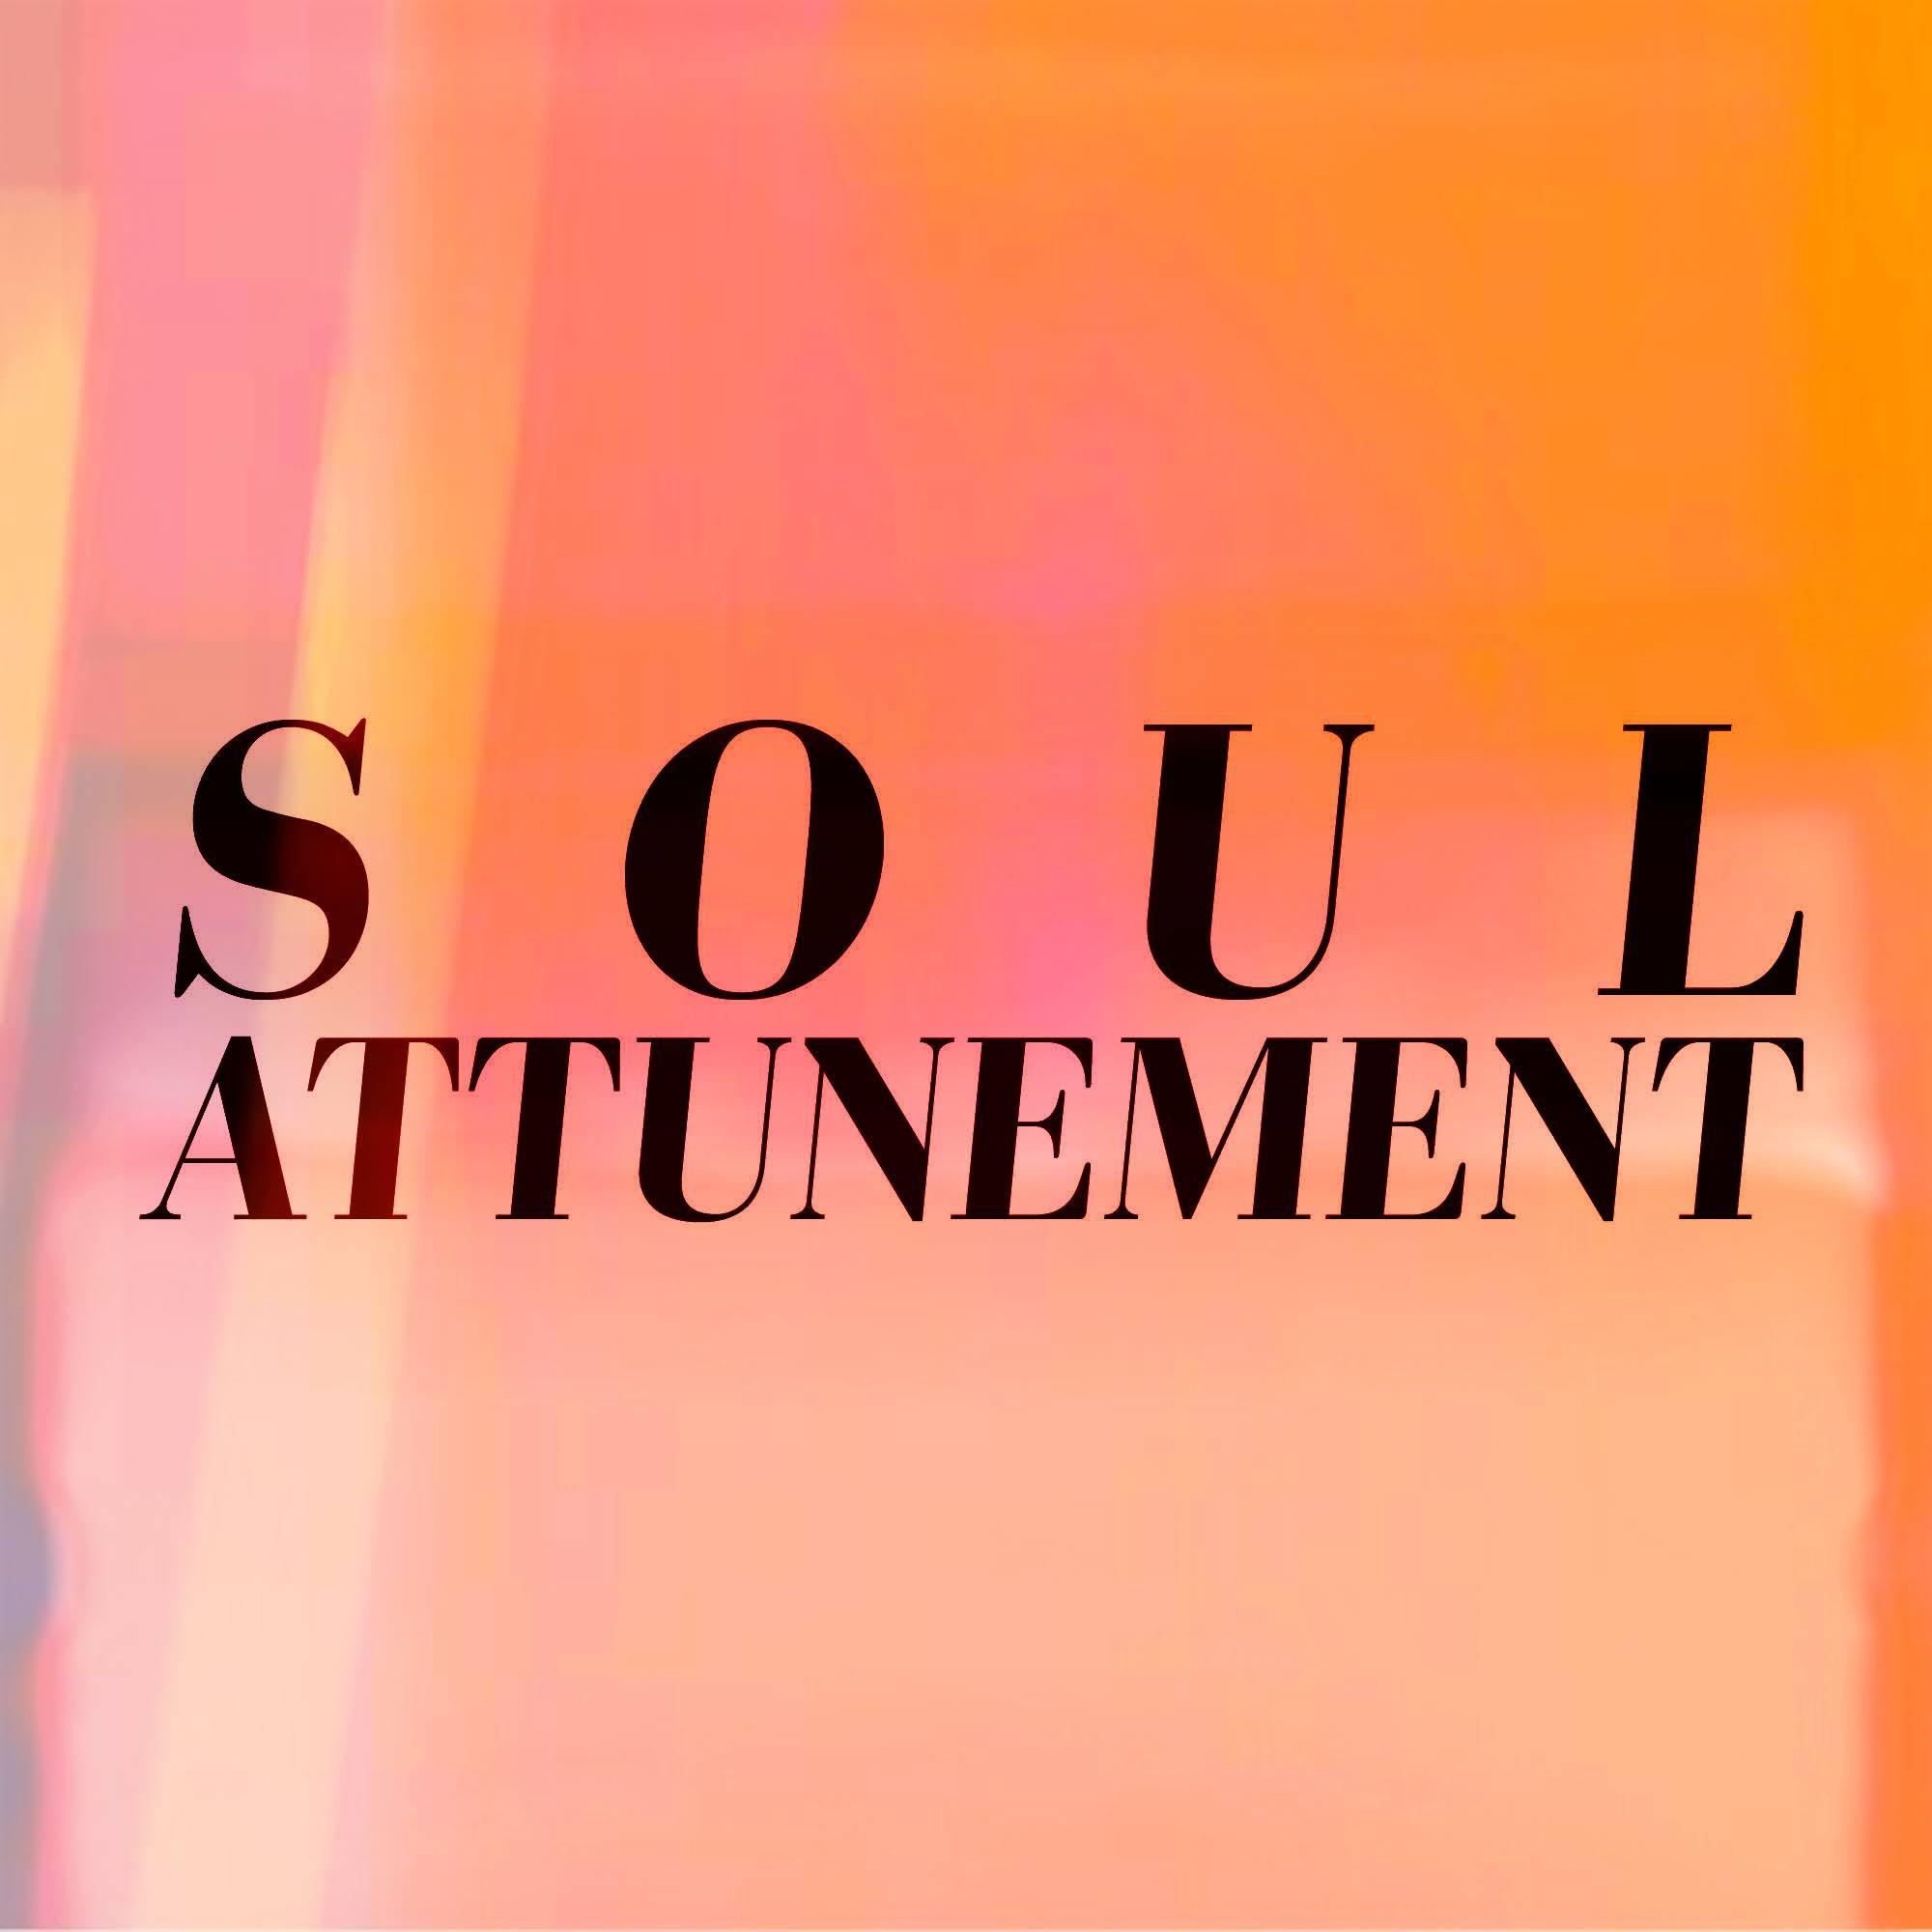 Soul Attunement